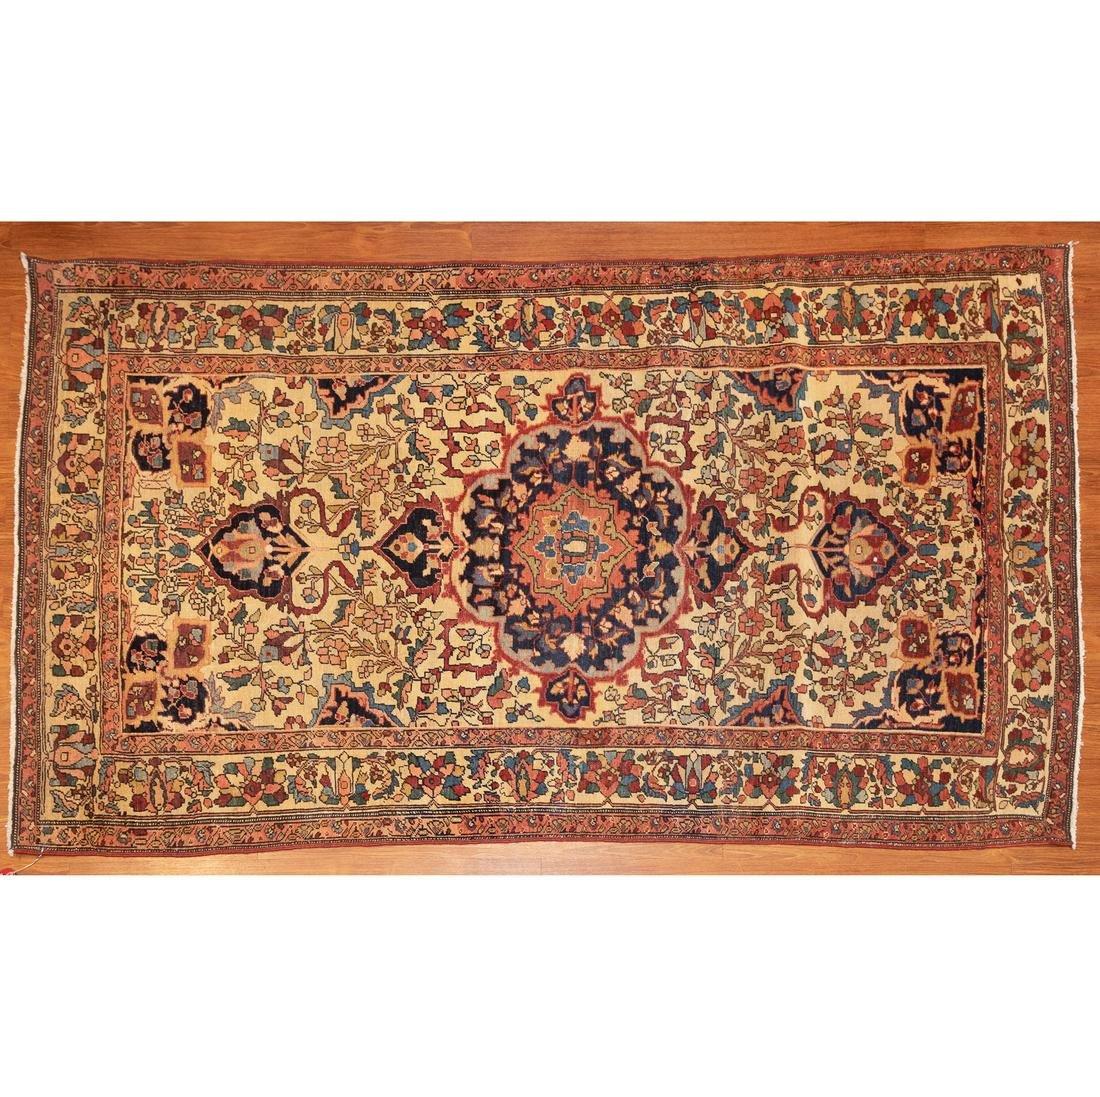 Antique Fereghan Sarouk Rug, Persia, 4.2 x 6.10